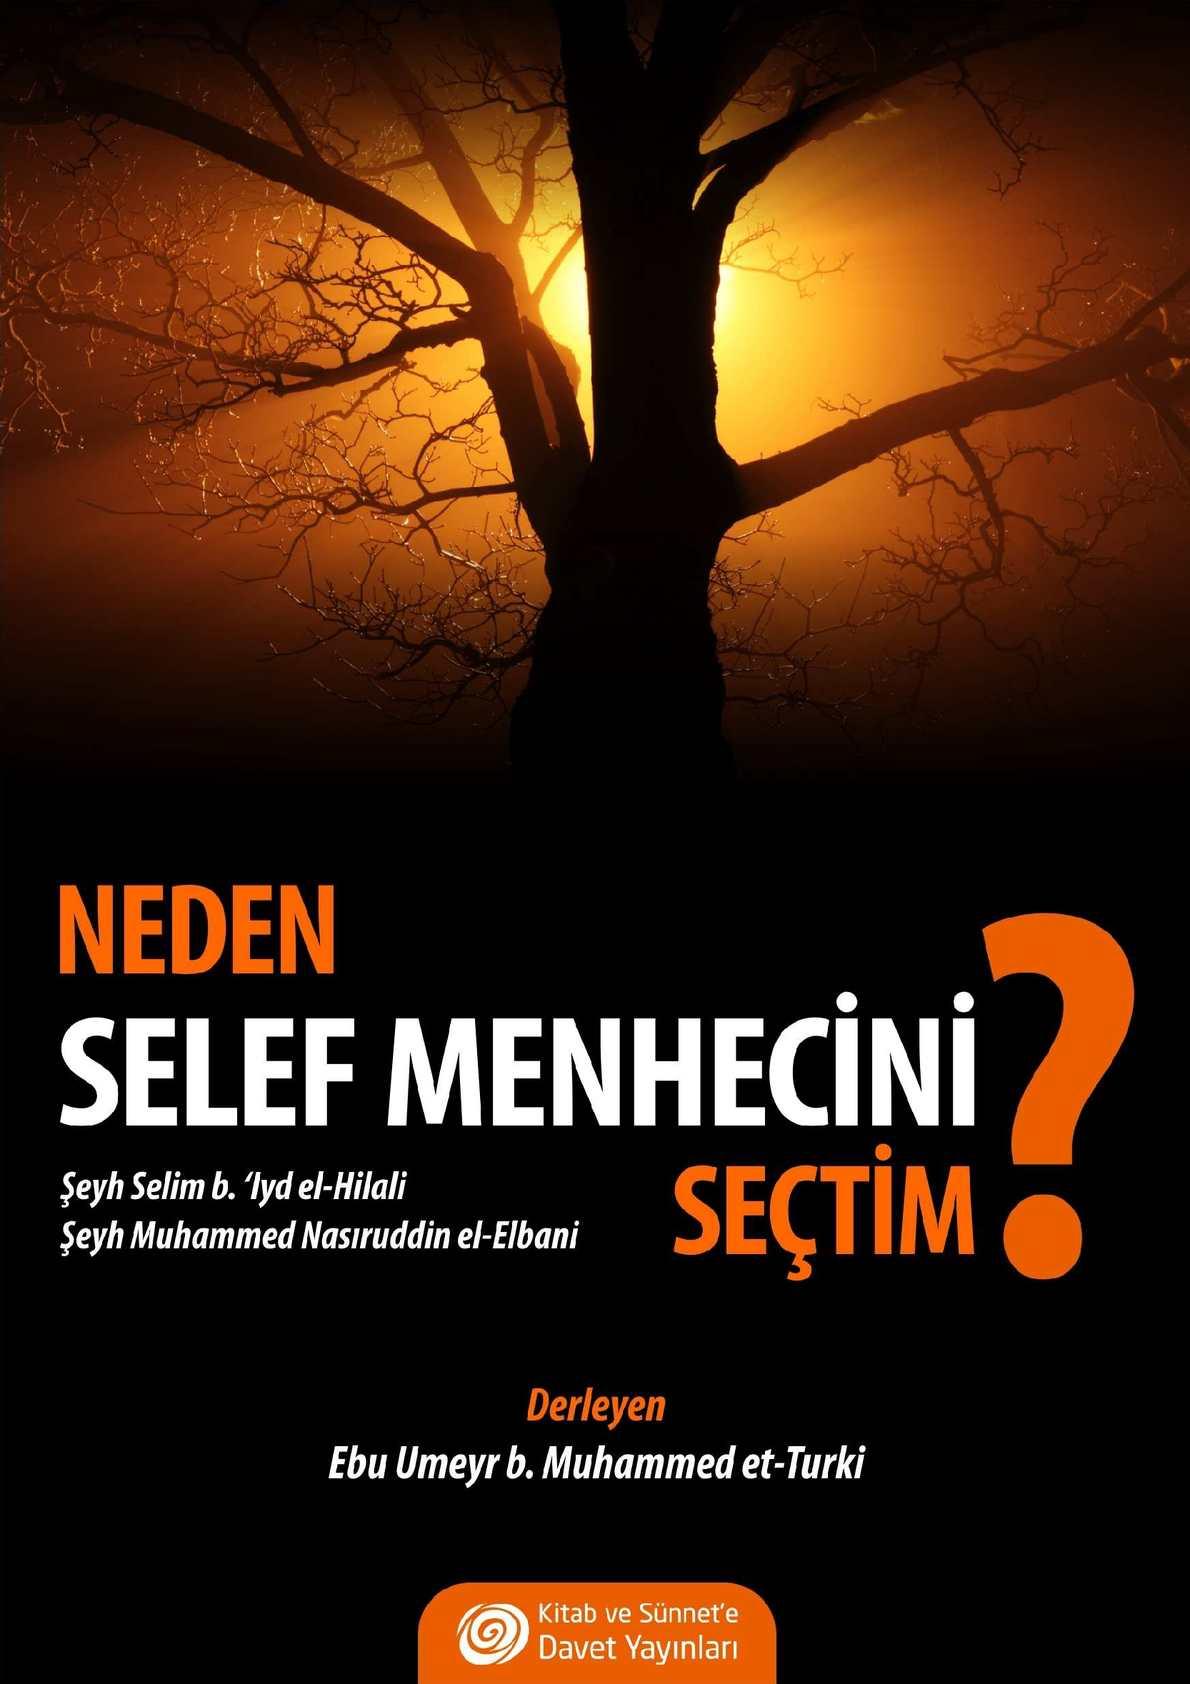 Neden Selef Menhecini Seçtim? Şeyh el-Hilali / Şeyh el-Elbani